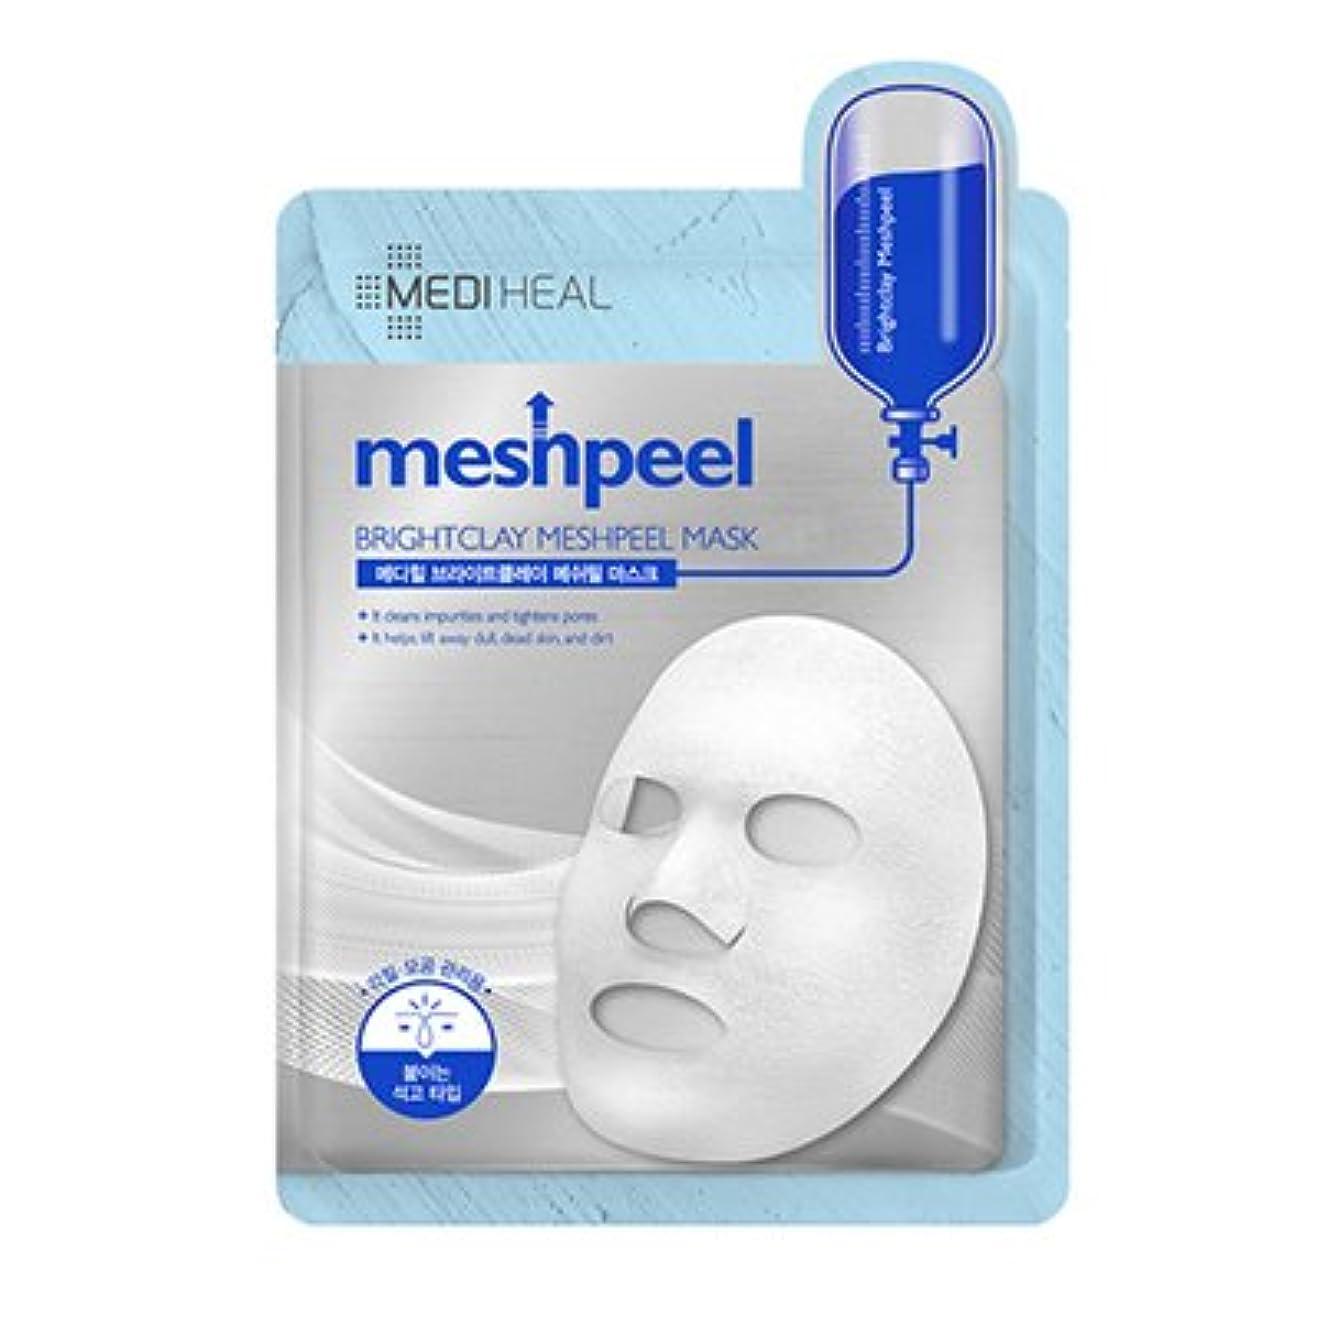 [New] MEDIHEAL Brightclay Meshpeel Mask 17g × 10EA/メディヒール ブライト クレイ メッシュ ピール マスク 17g × 10枚